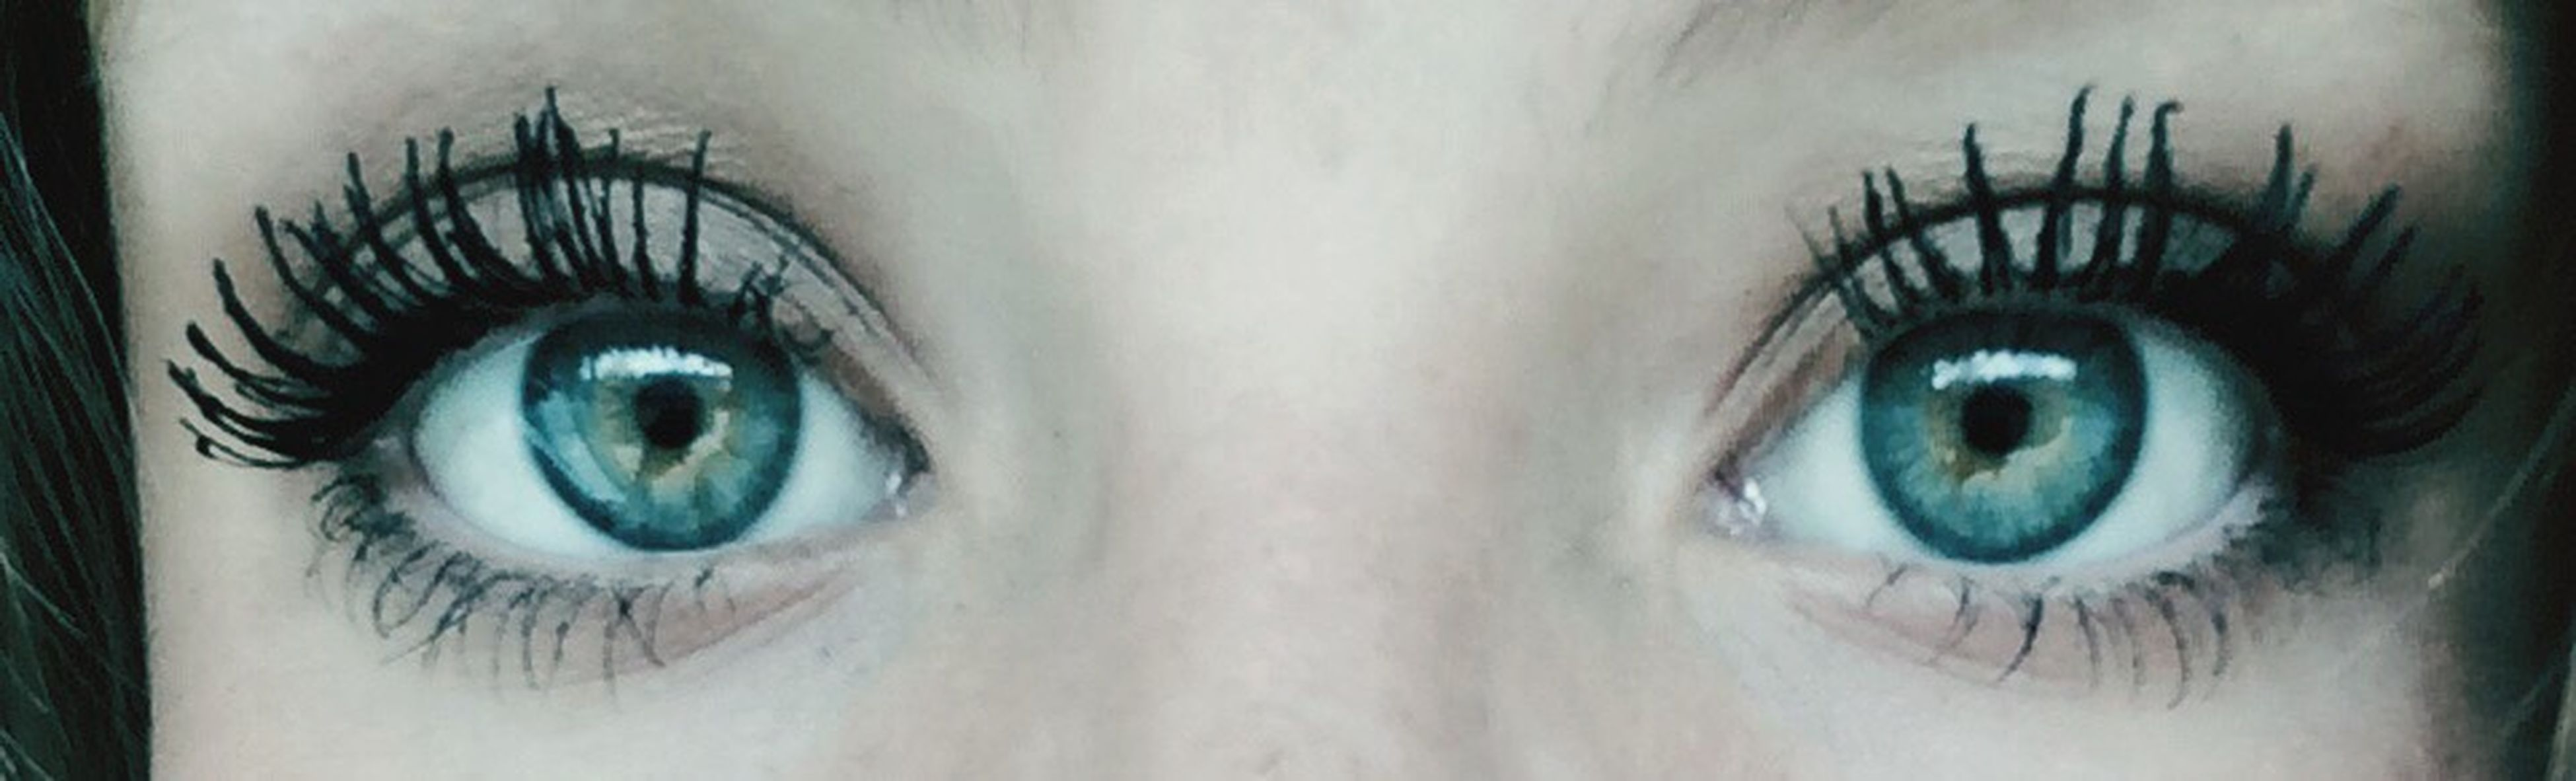 looking at camera, human eye, portrait, close-up, indoors, full frame, eyesight, eyelash, sensory perception, circle, backgrounds, auto post production filter, part of, digital composite, human face, extreme close-up, staring